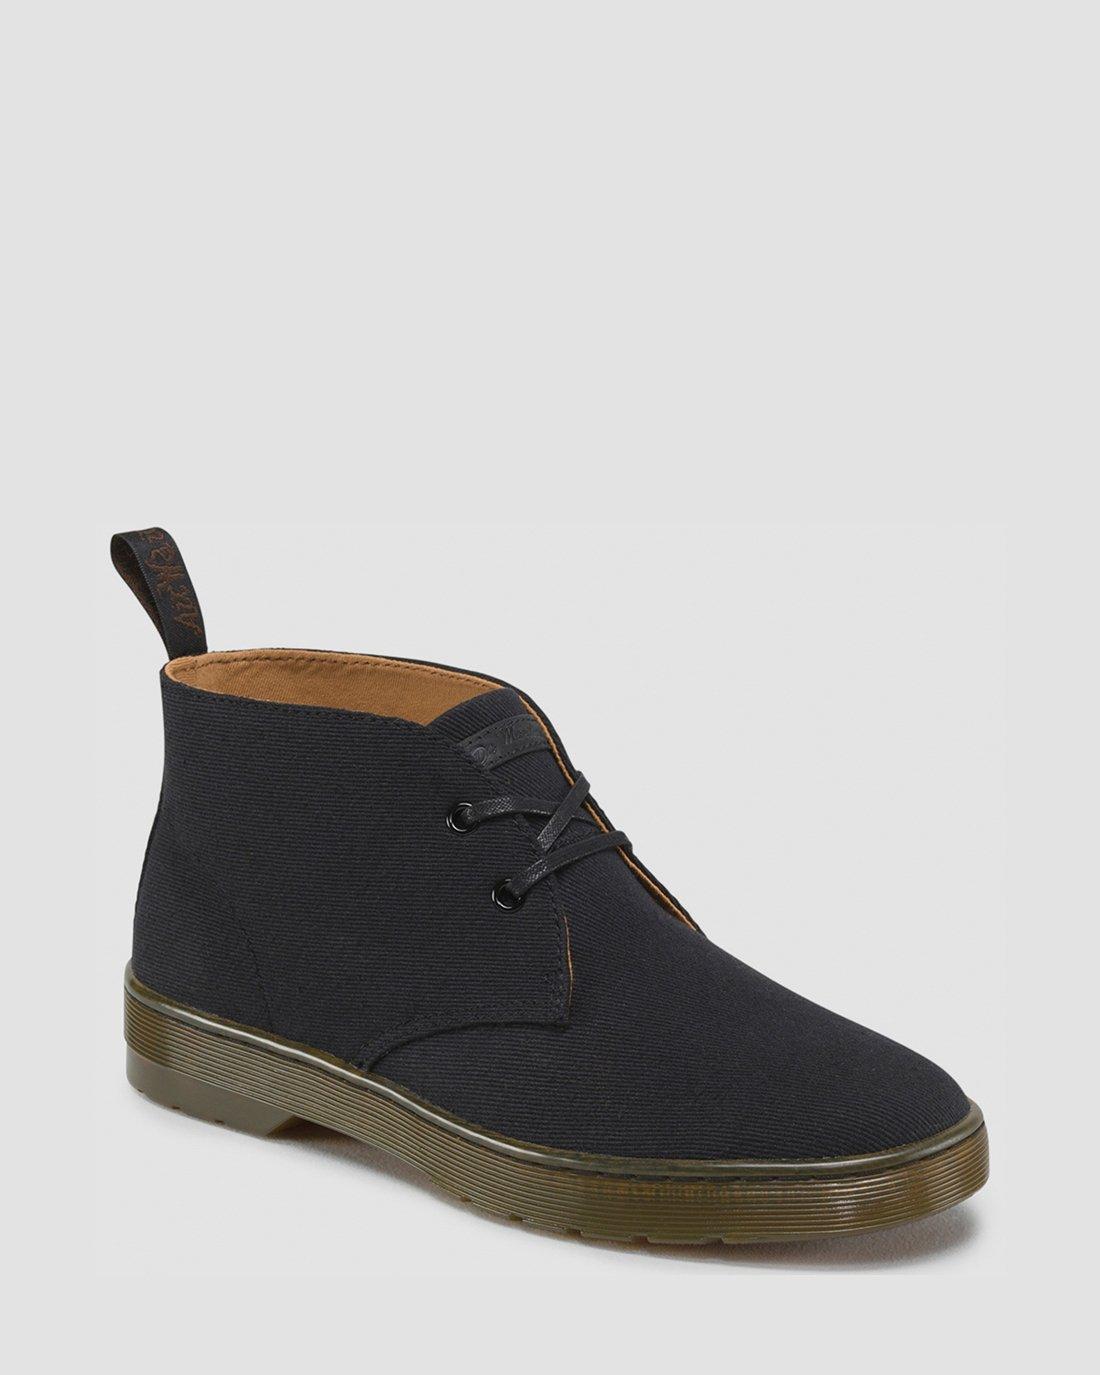 Dr. Martens MAYPORT Twill Canvas Herren Desert Boots Schuhe